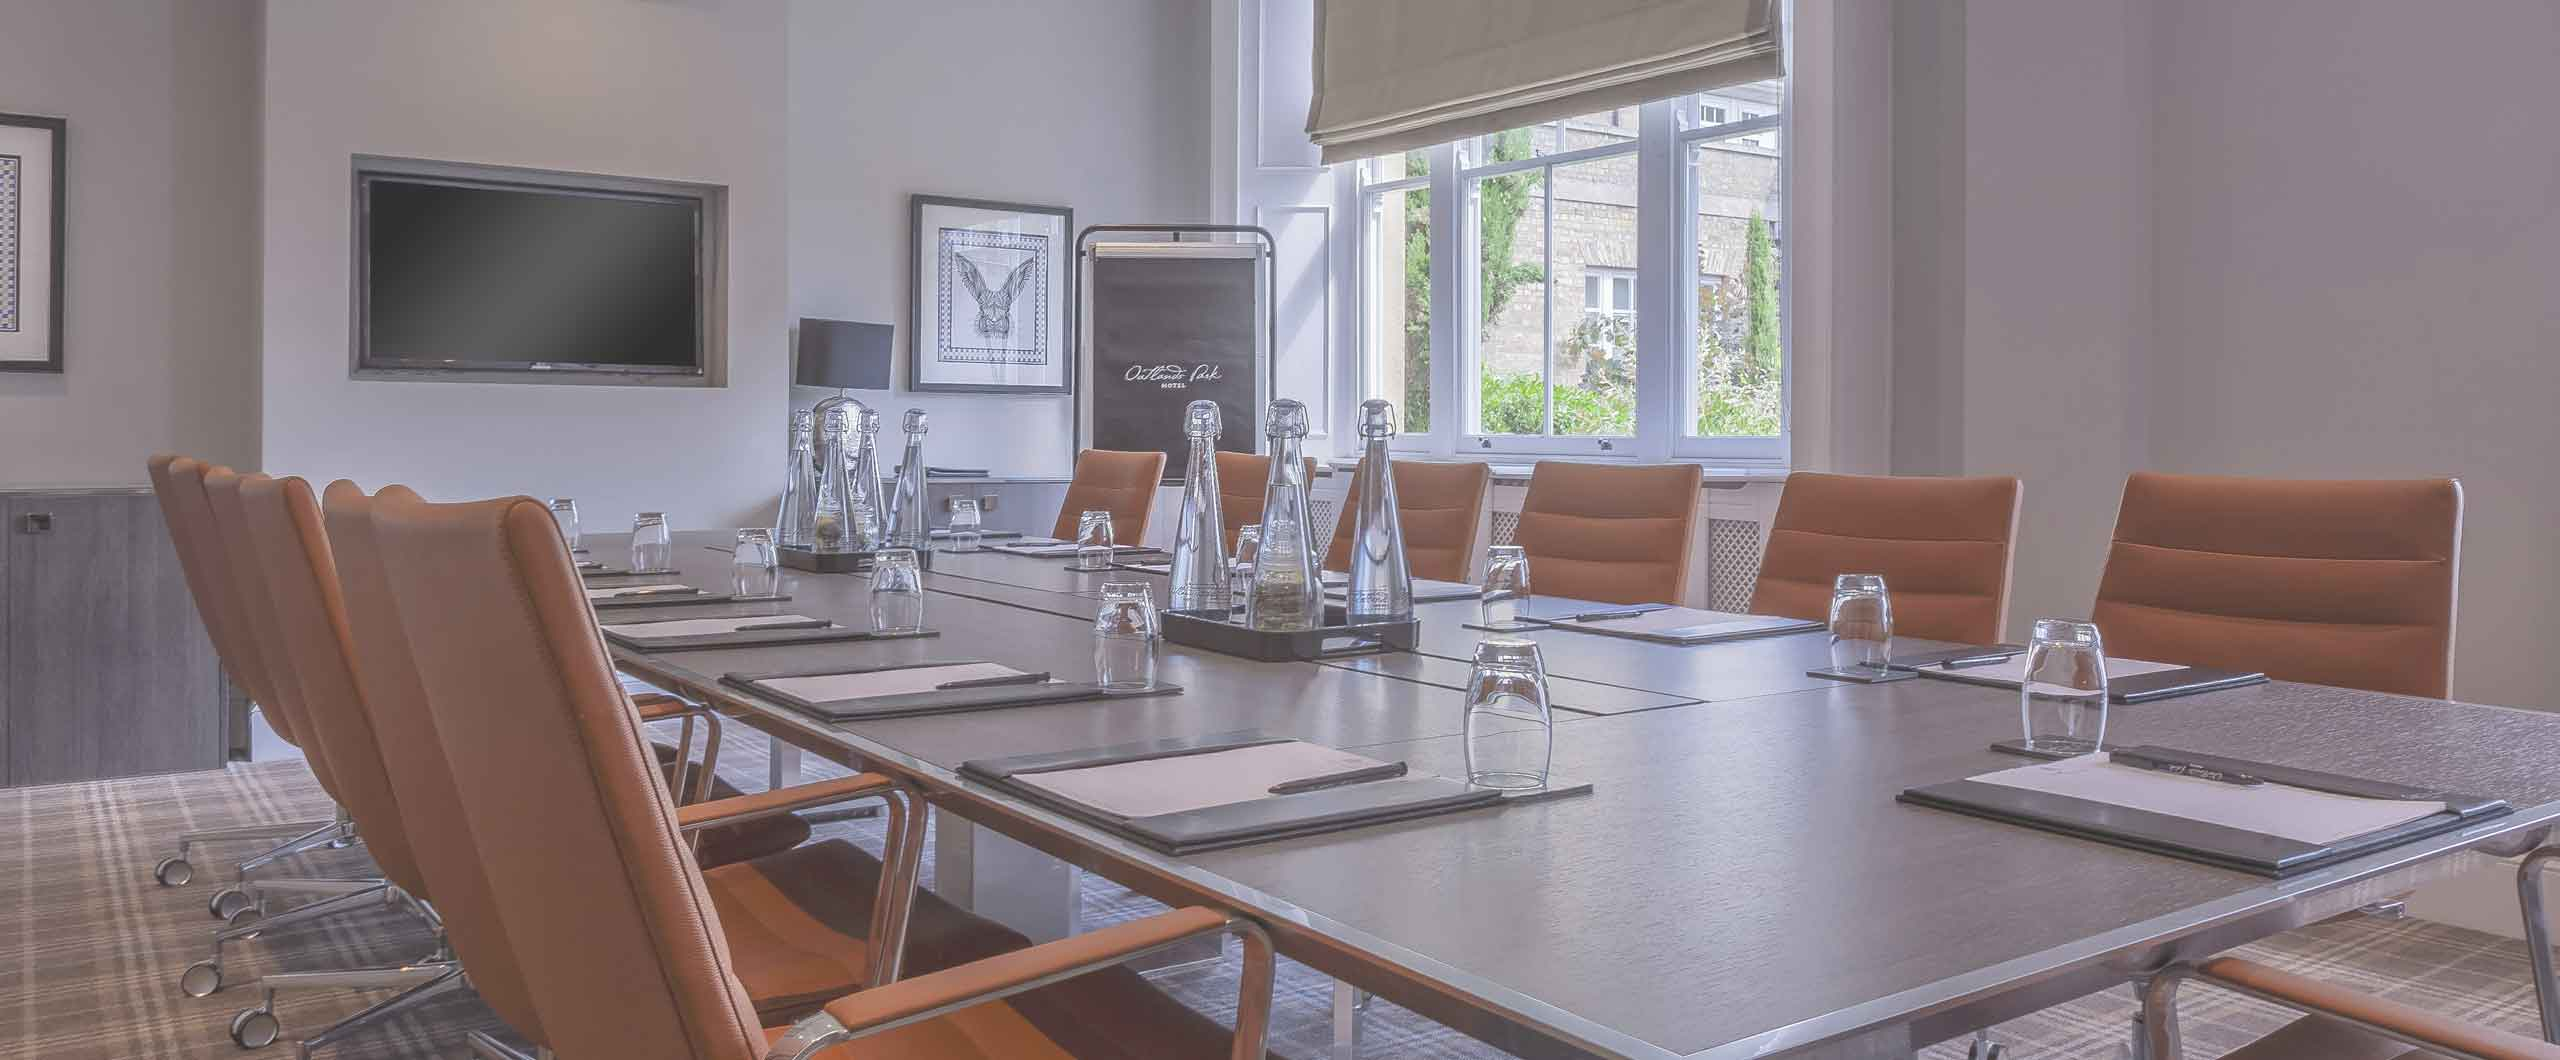 Meeting room hire Surrey